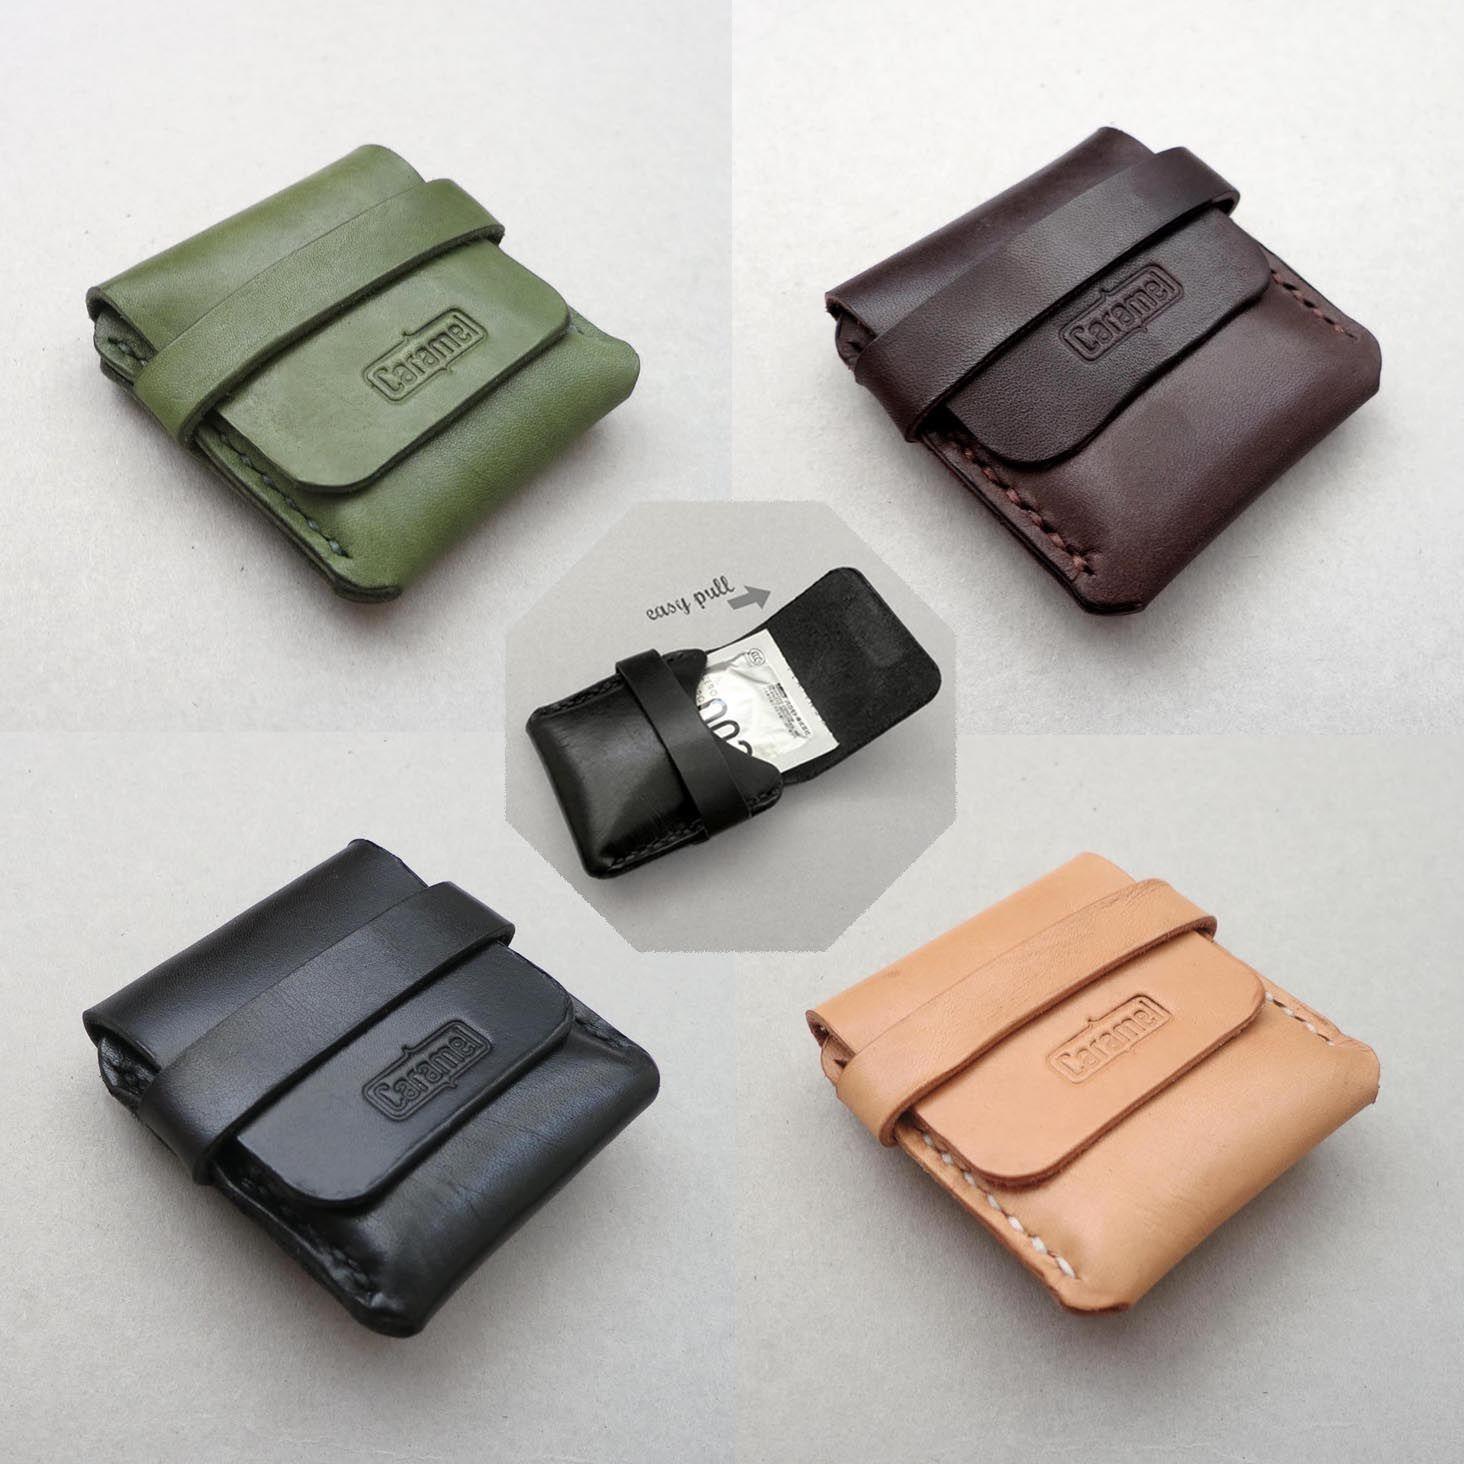 Condom / Coin Case   Leather   Pinterest - photo#43